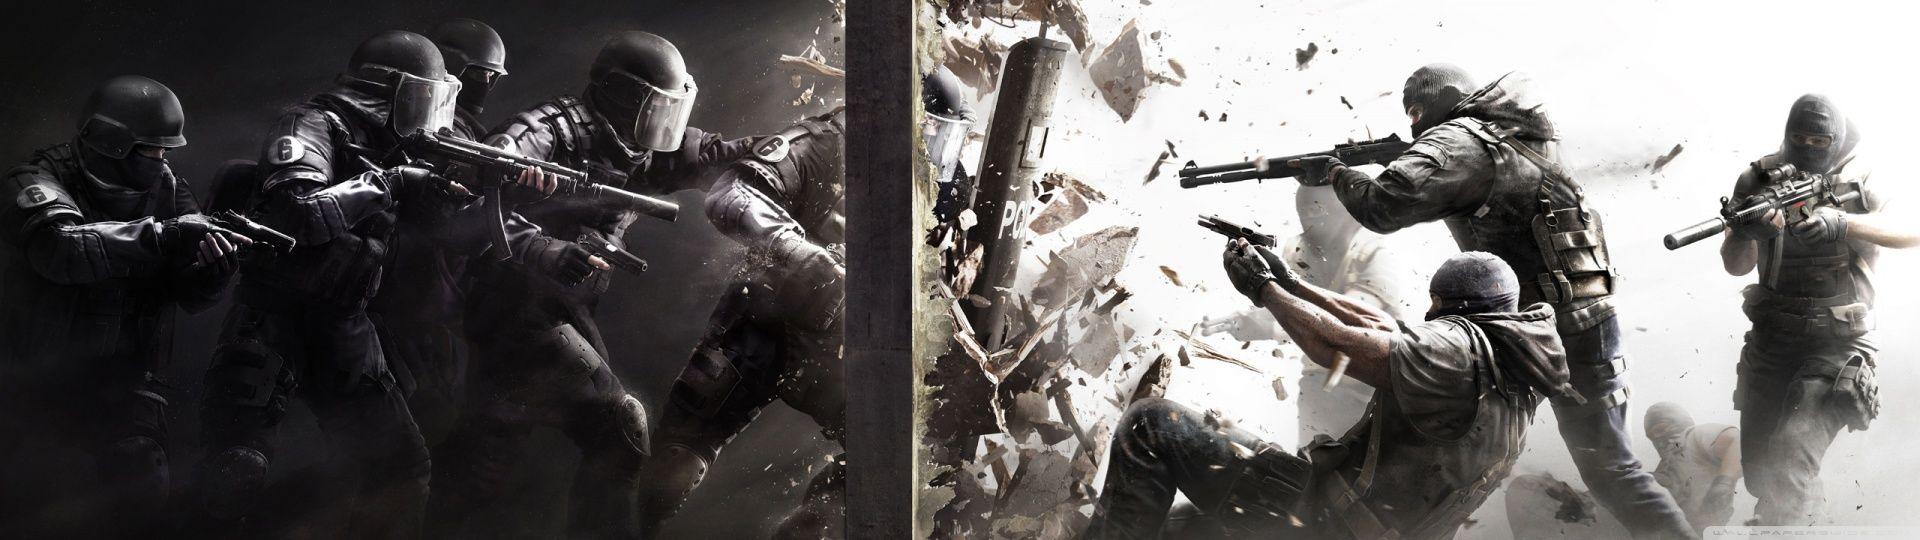 Tom Clancys Rainbow Six Siege Hd Desktop Wallpaper High With